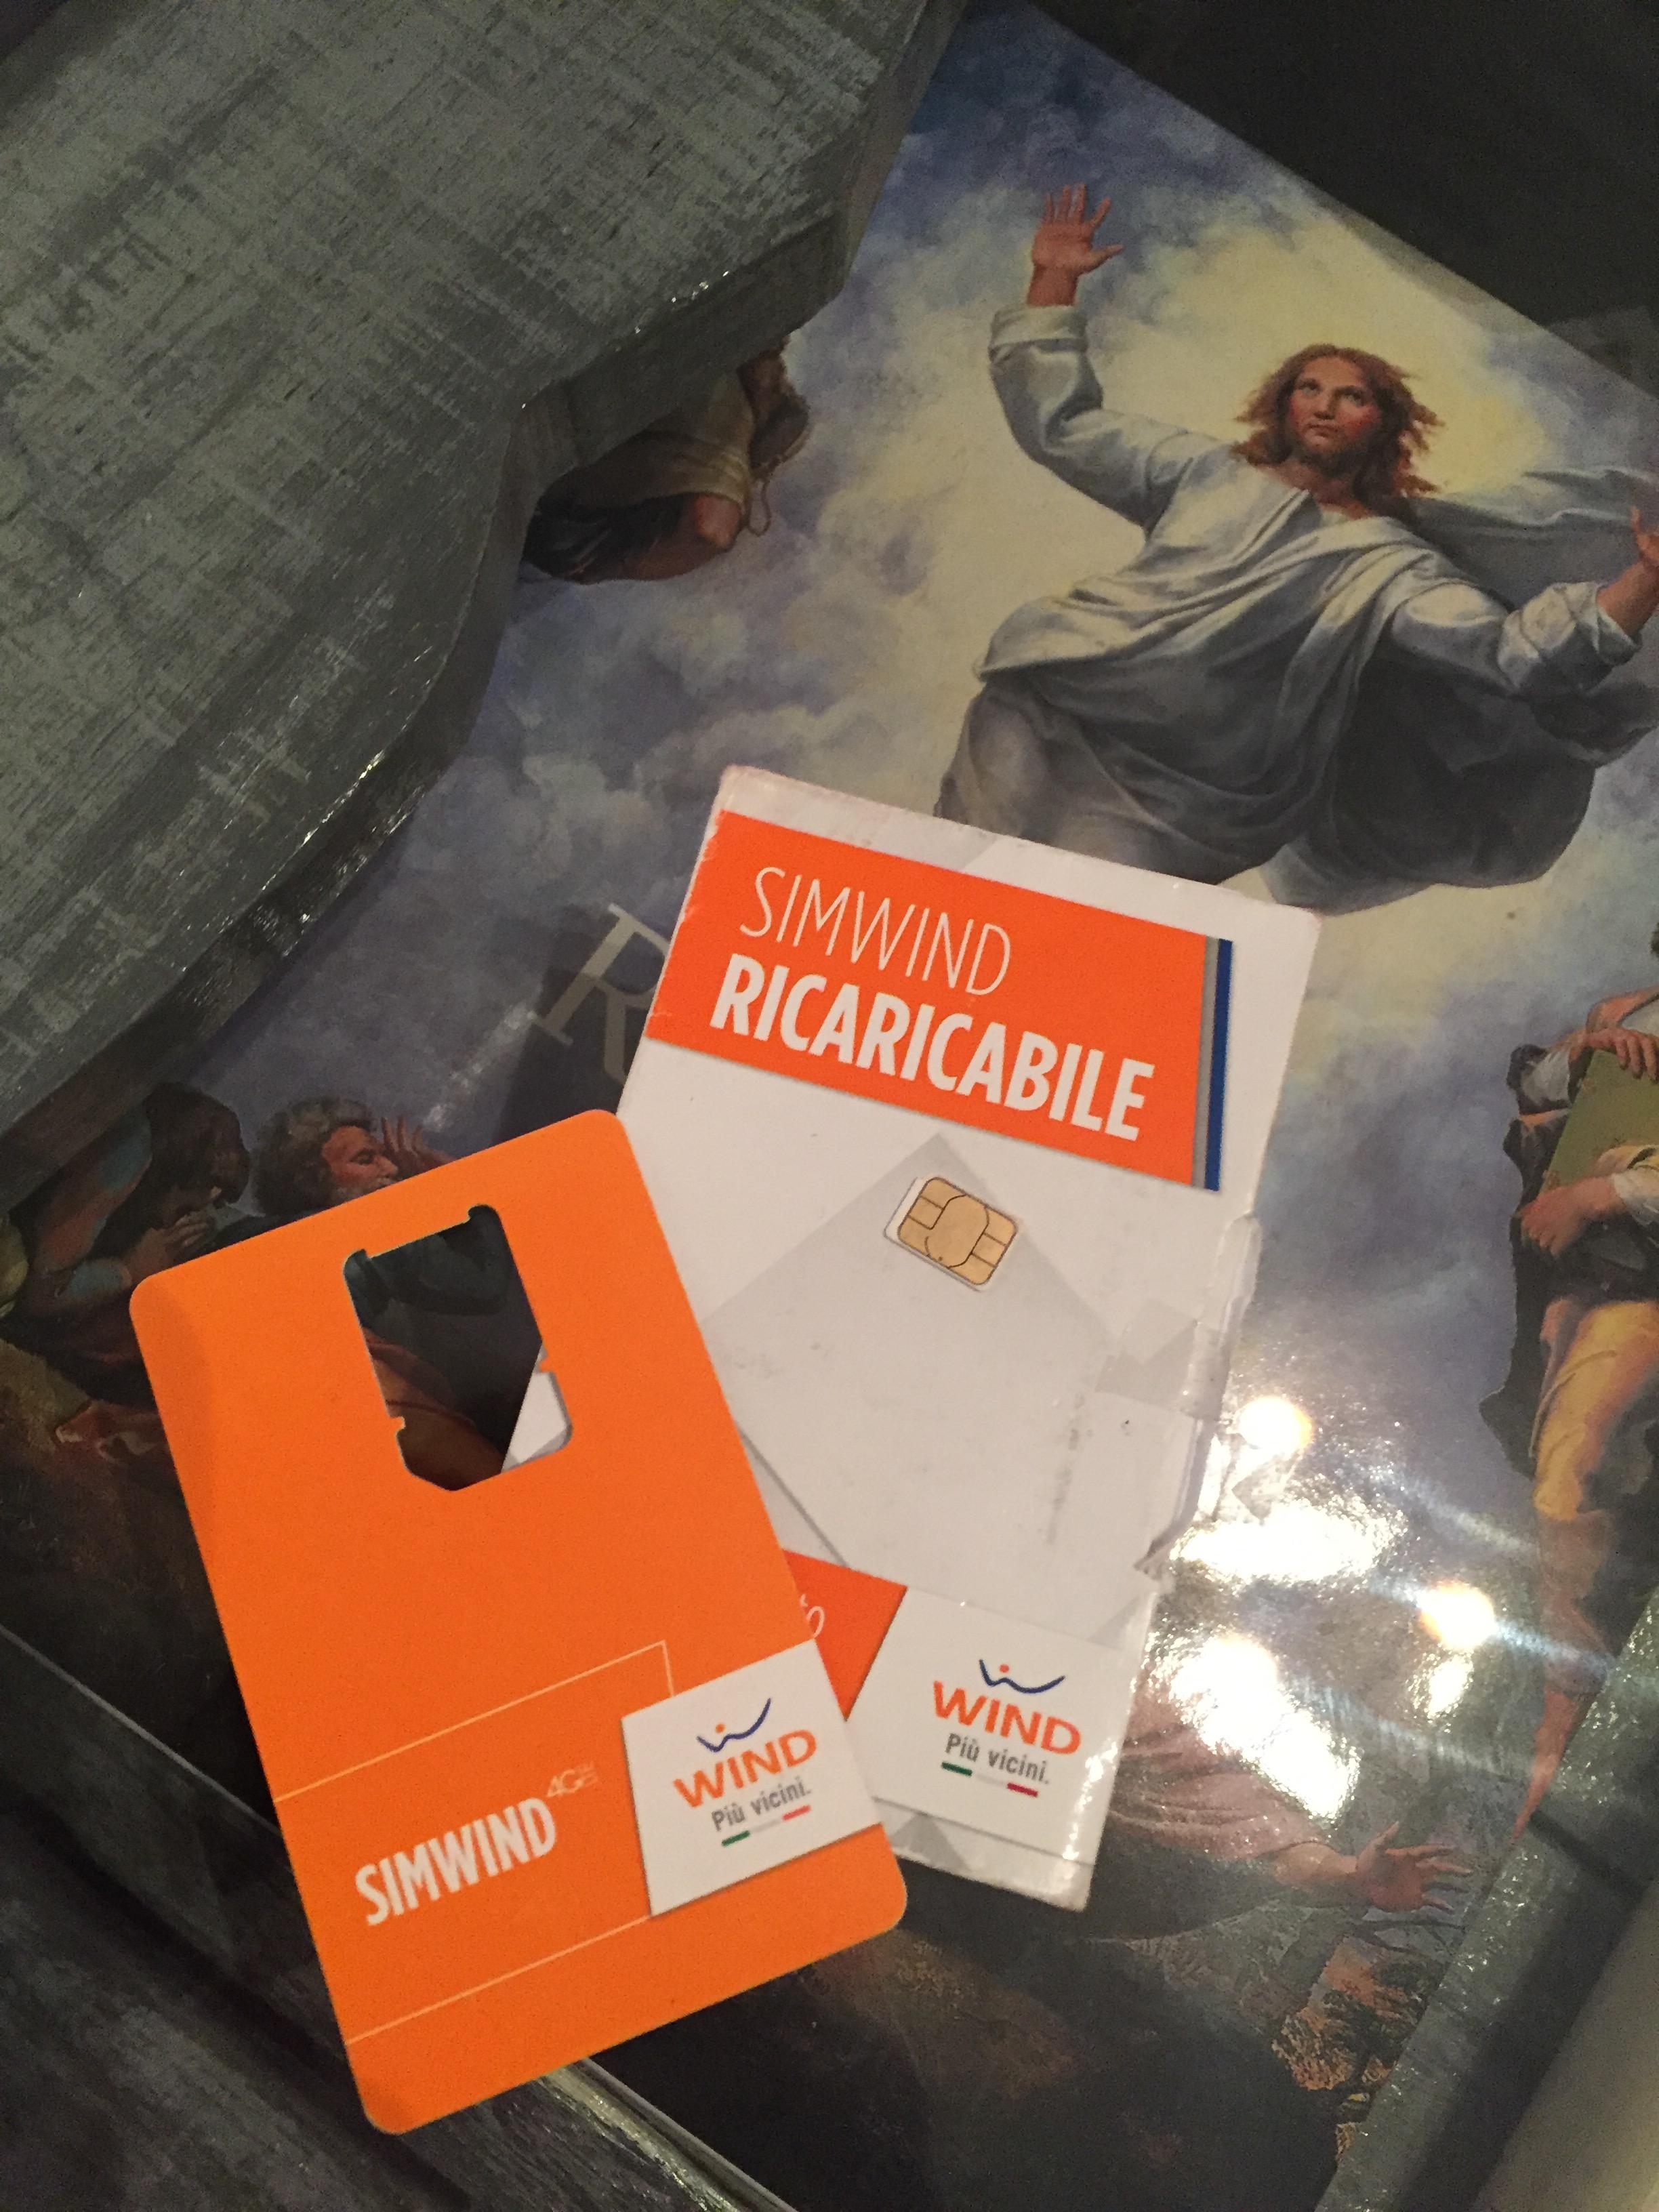 img 6228 - Chip de celular en Italia para viajes